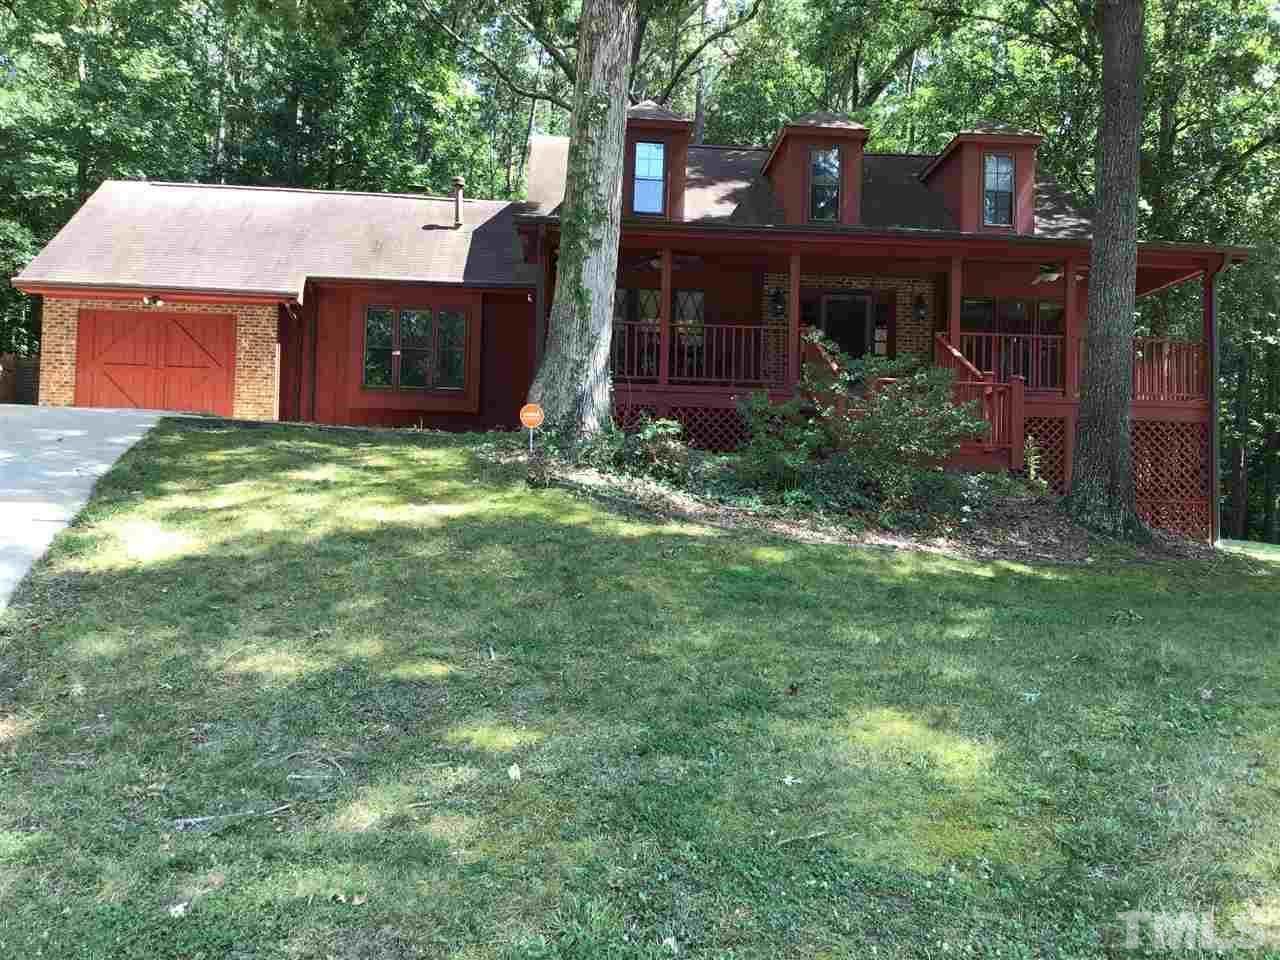 1609 Sycamore Drive, Garner, NC 27529-4434 - MLS#: 2332375